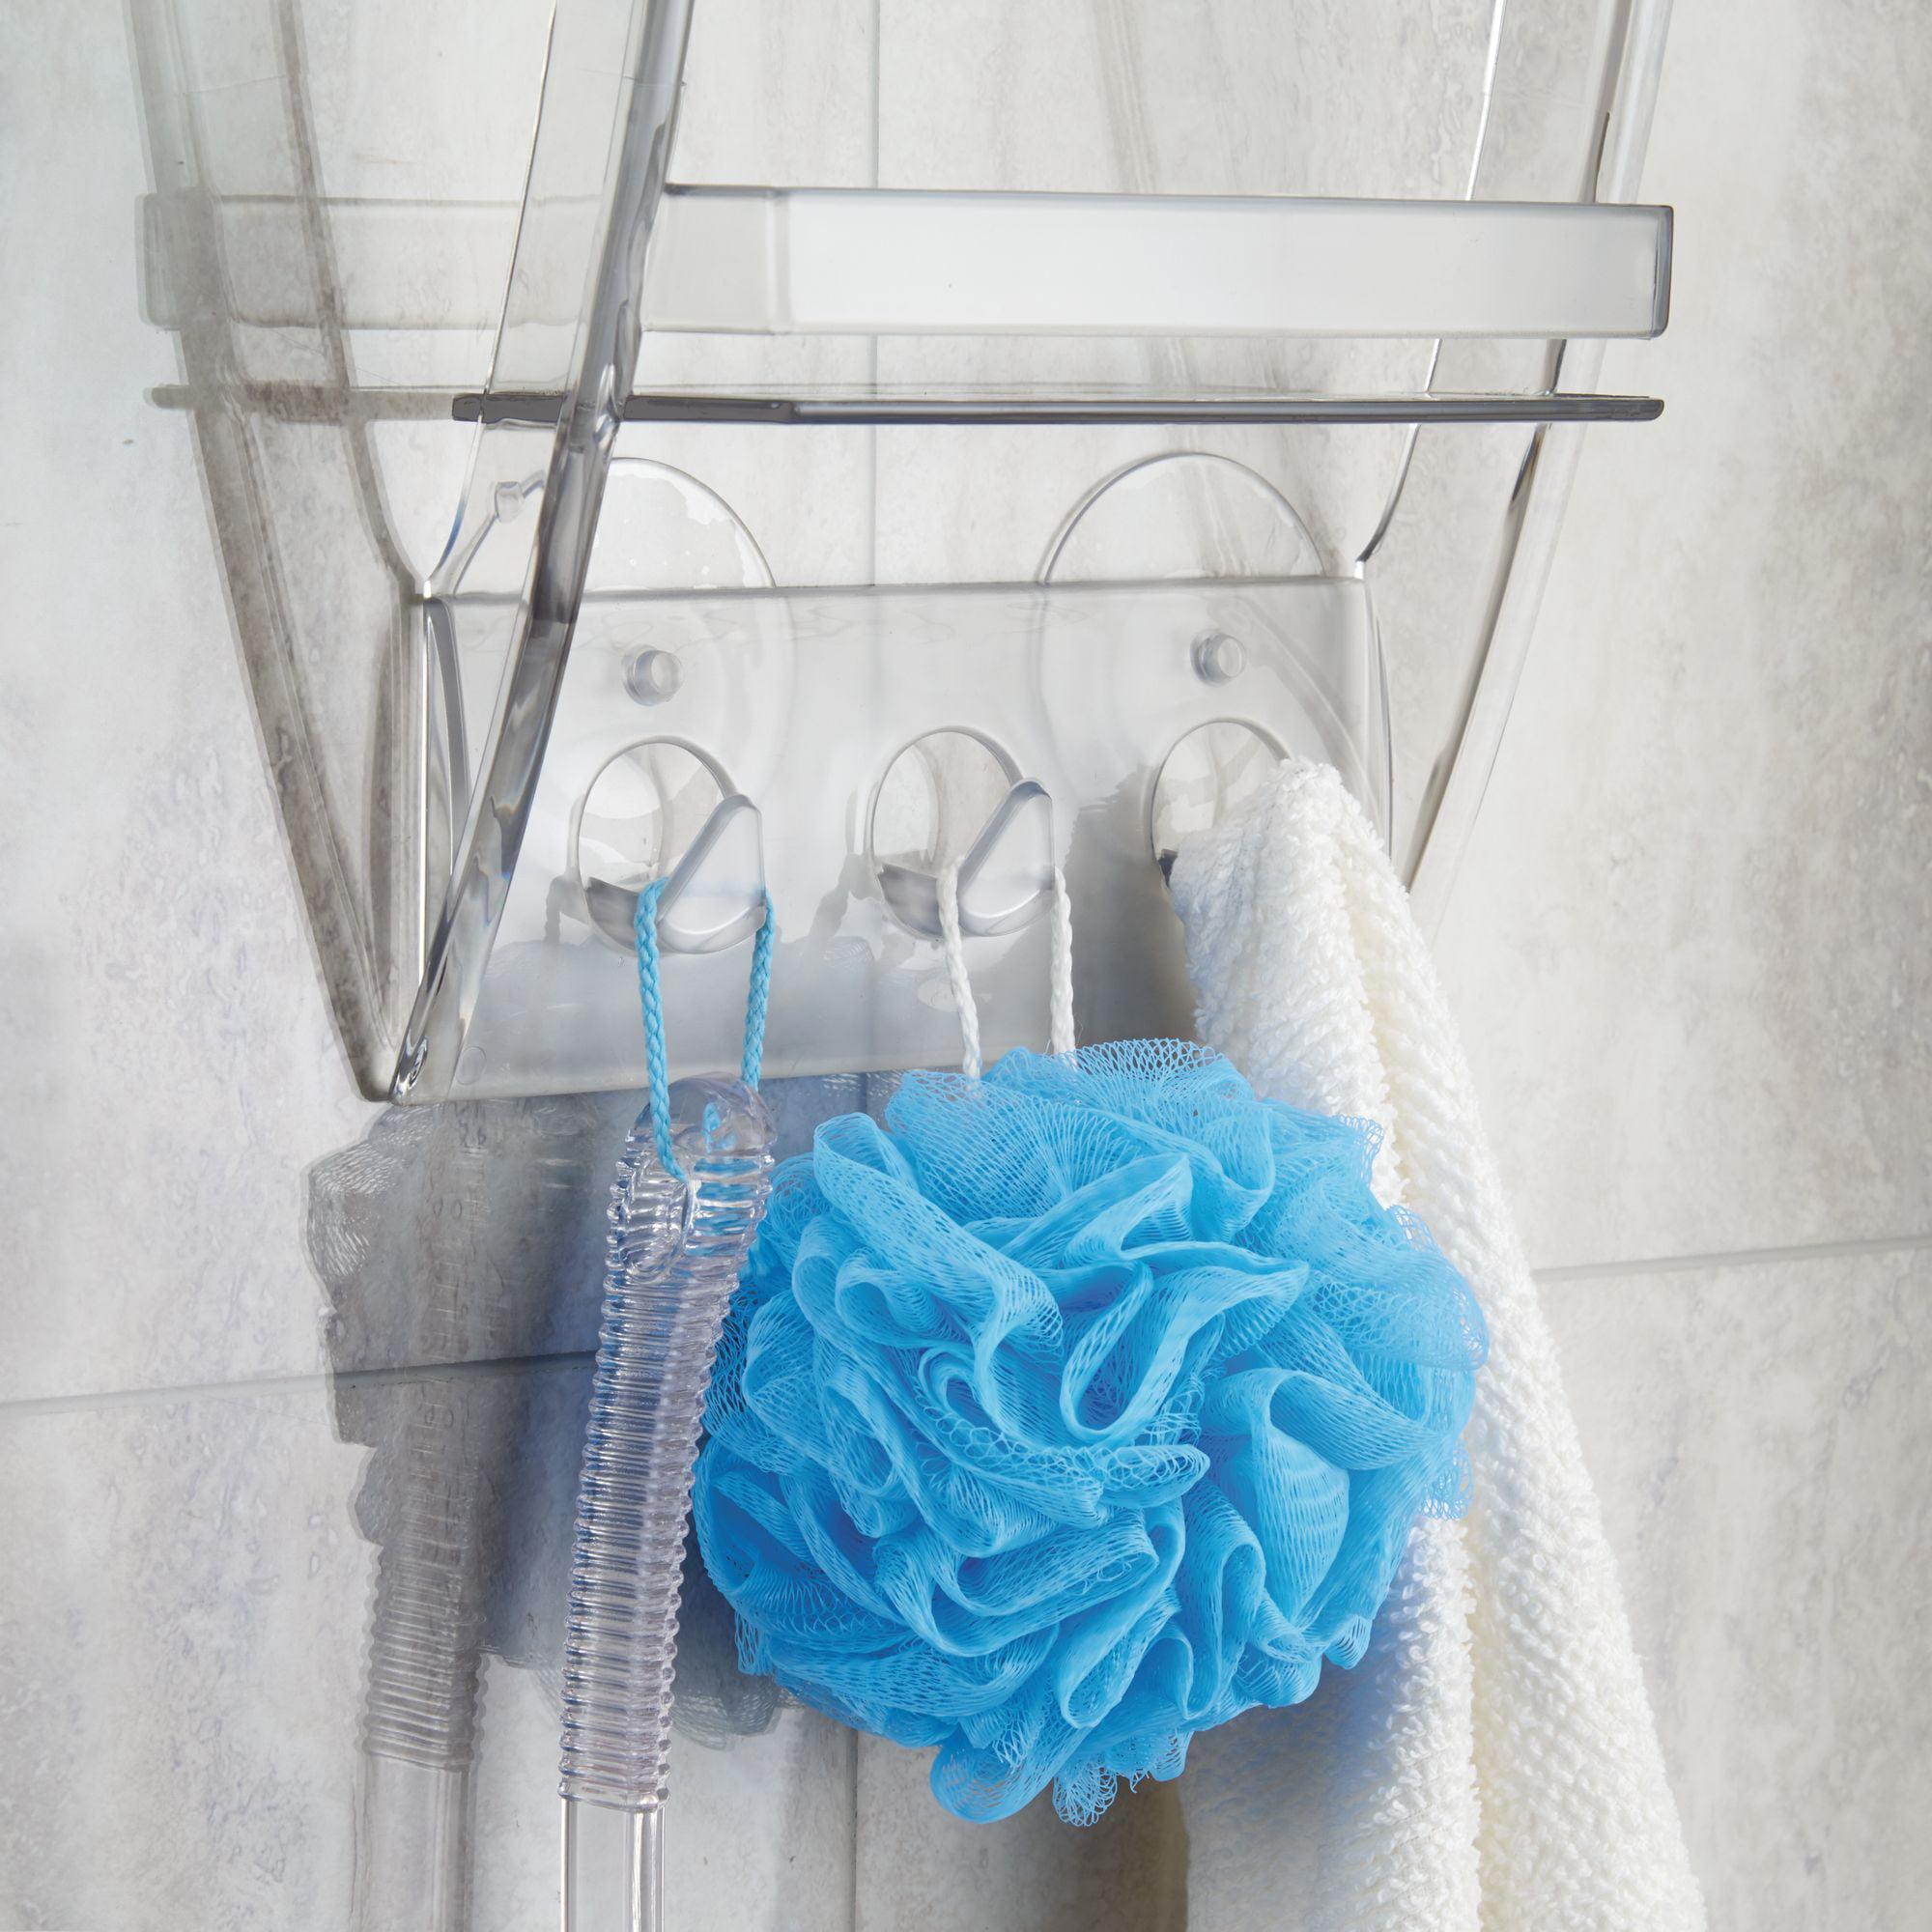 Famous Over Shower Door Caddy Vignette - Bathtub Design Ideas ...